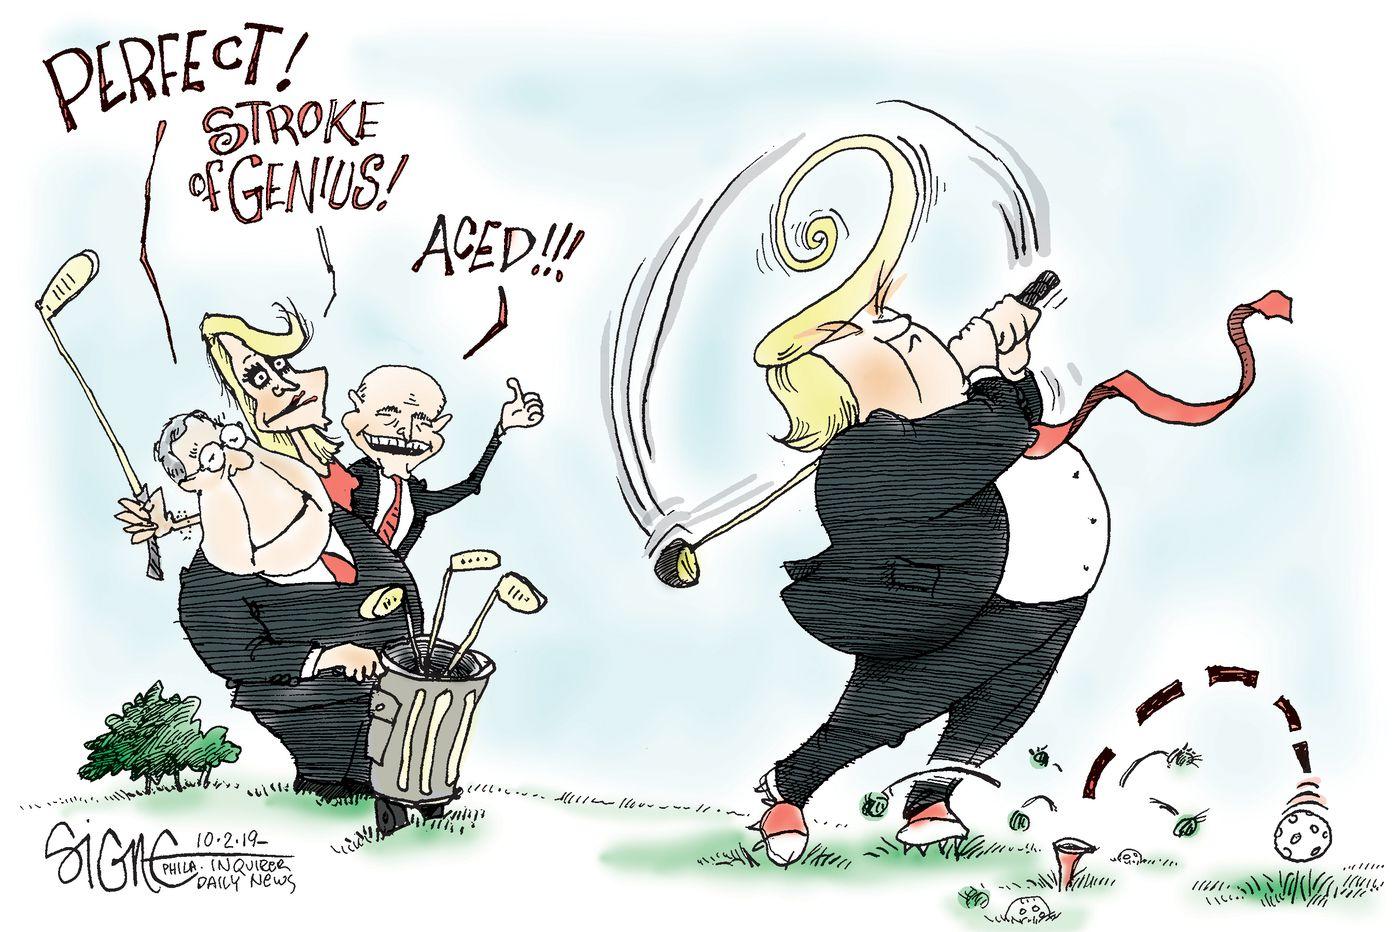 Political Cartoon Trump S Golf Stroke Of Genius